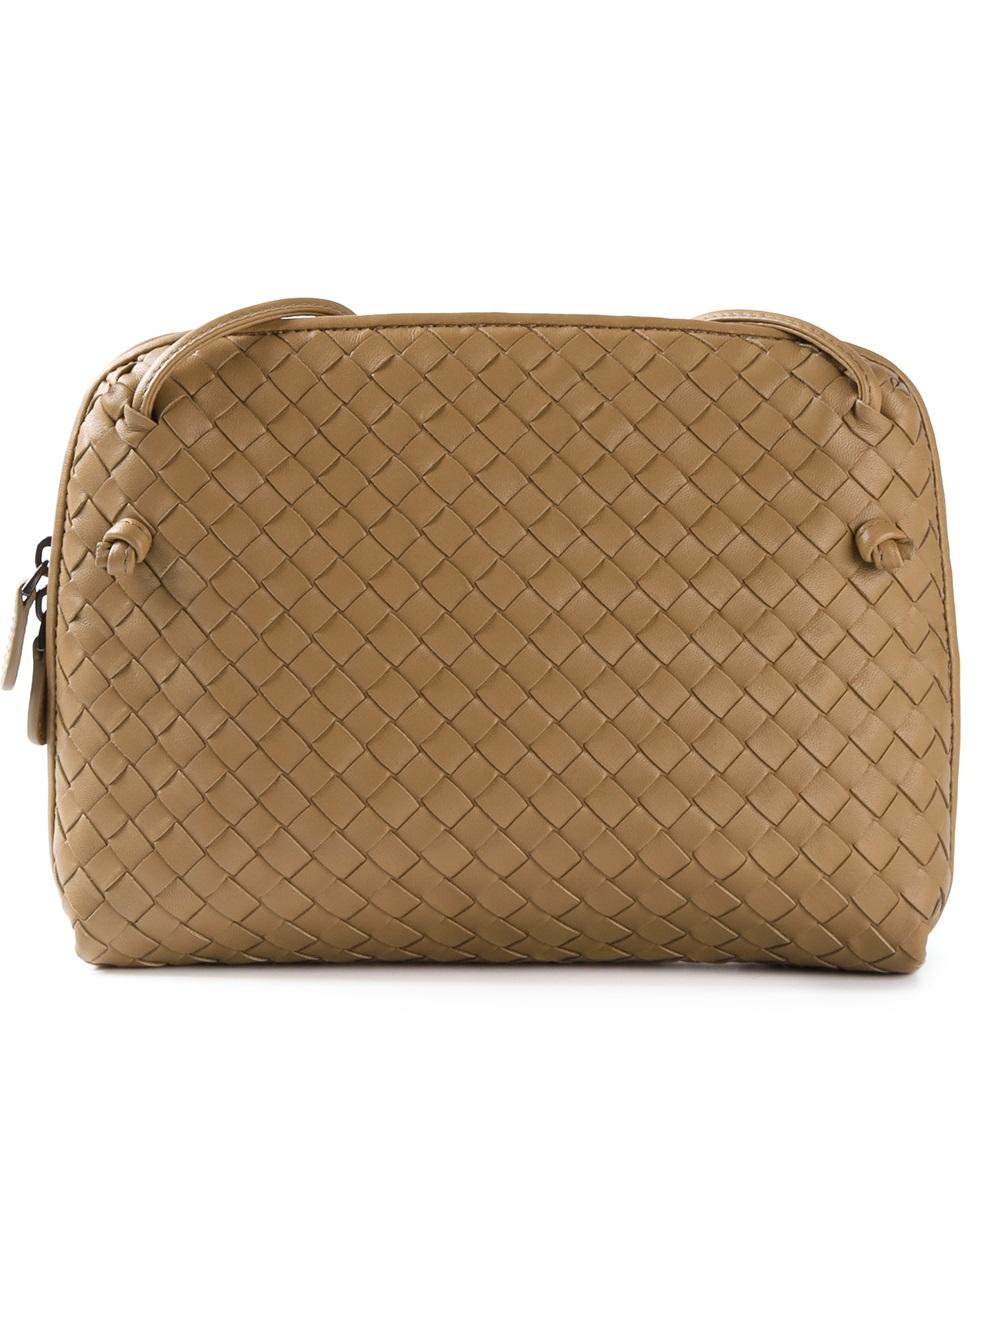 728f06599f9c Lyst - Bottega Veneta Woven Cross Body Bag in Brown